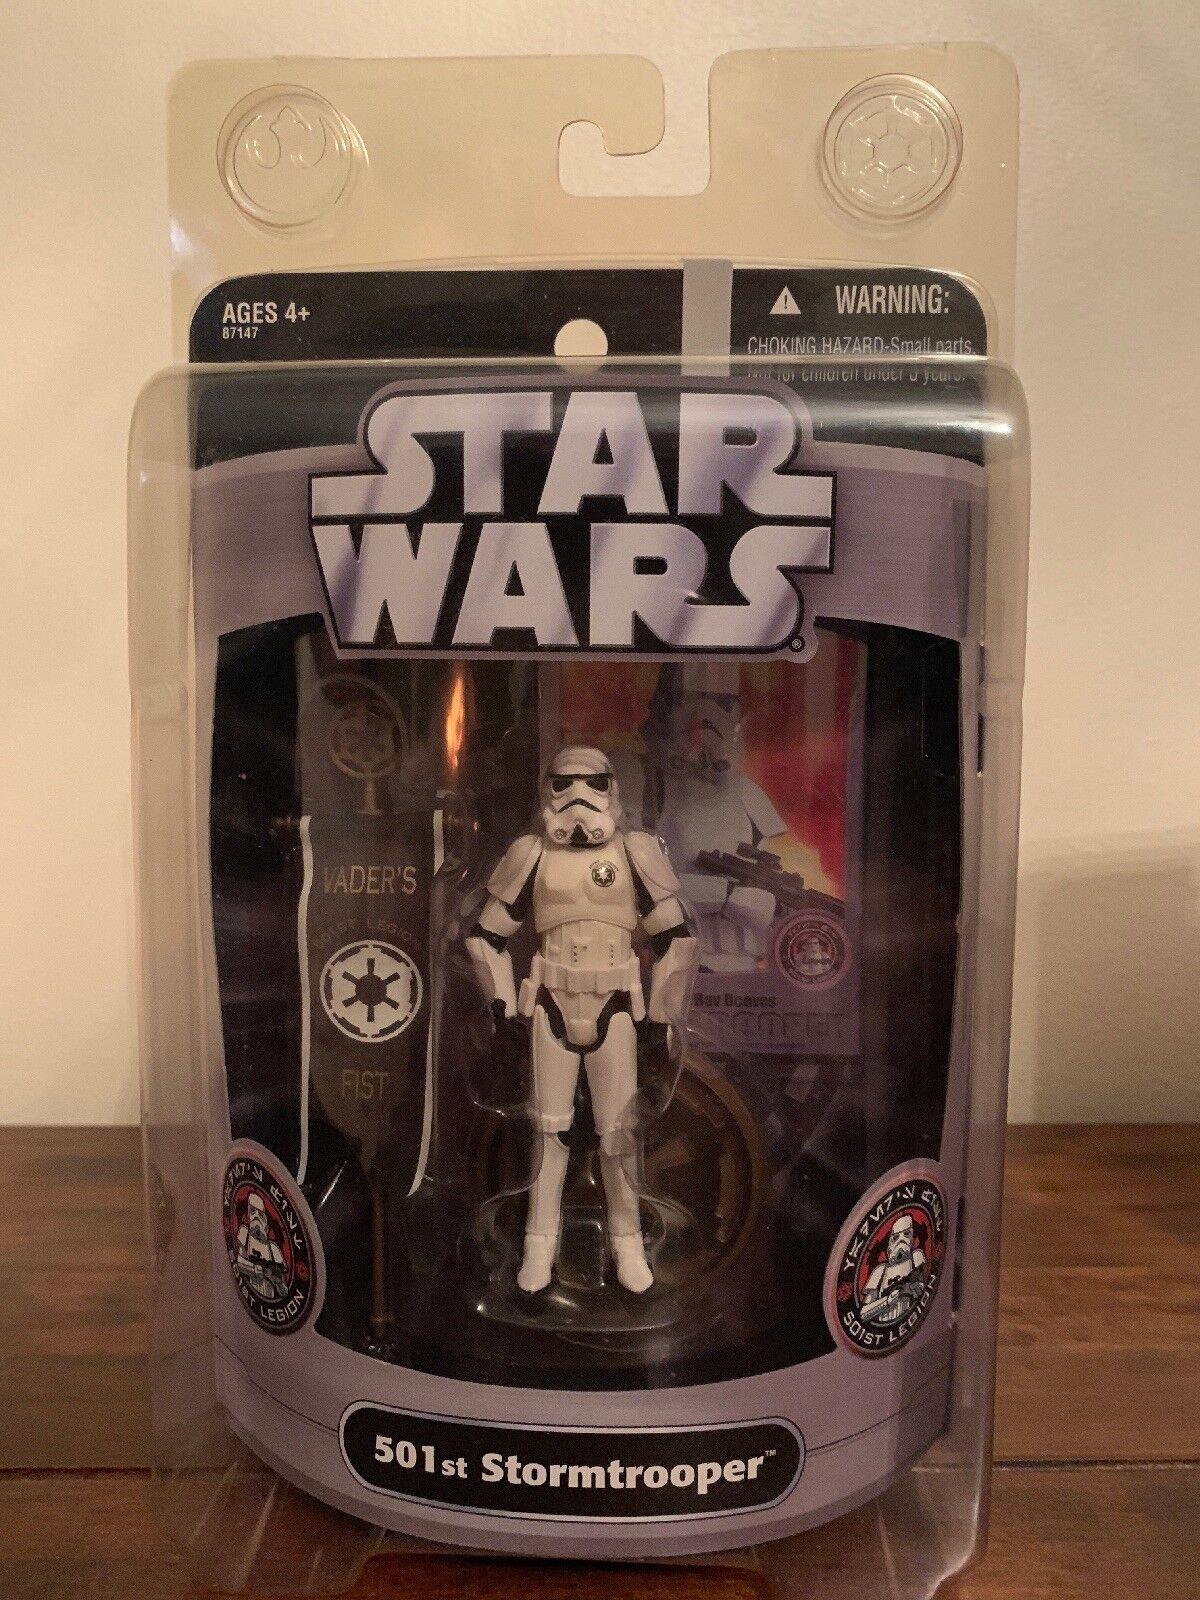 Star - wars - gekrempelt 501. stormtrooper vaders faust comic - con - exklusiv